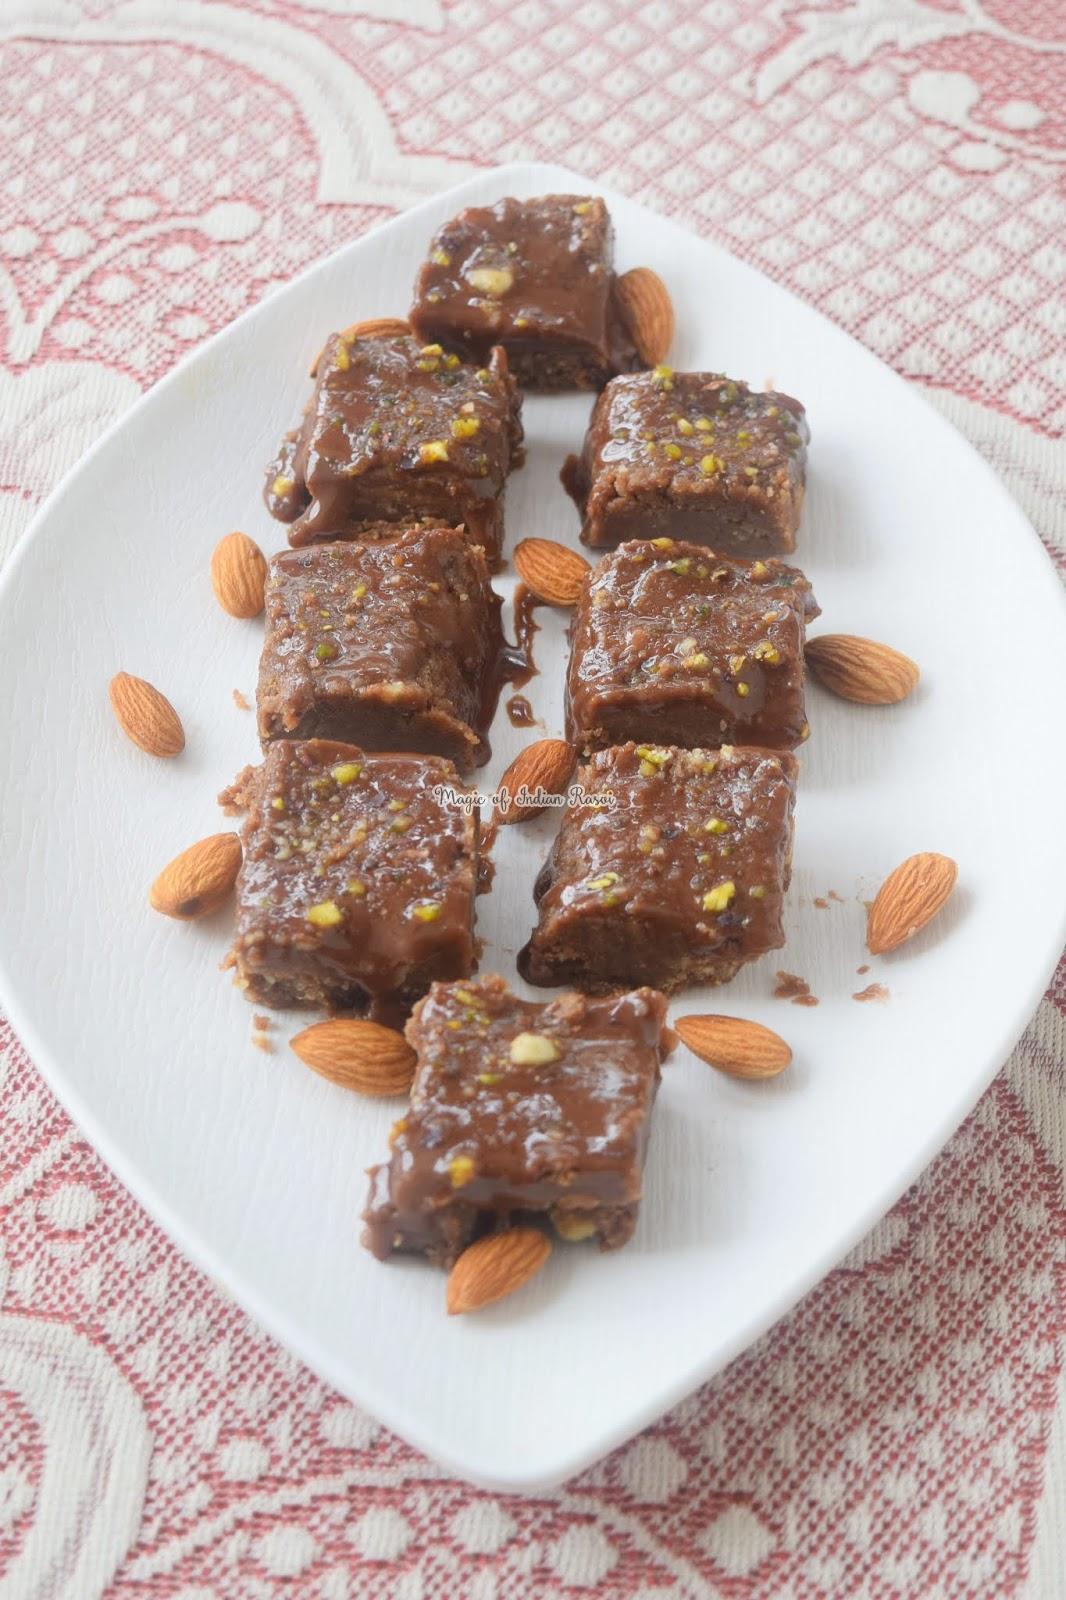 Biscuit Chocolate Fudge Recipe - चॉकलेट बिस्कुट बर्फी  रेसिपी - Priya R - Magic of Indian Rasoi